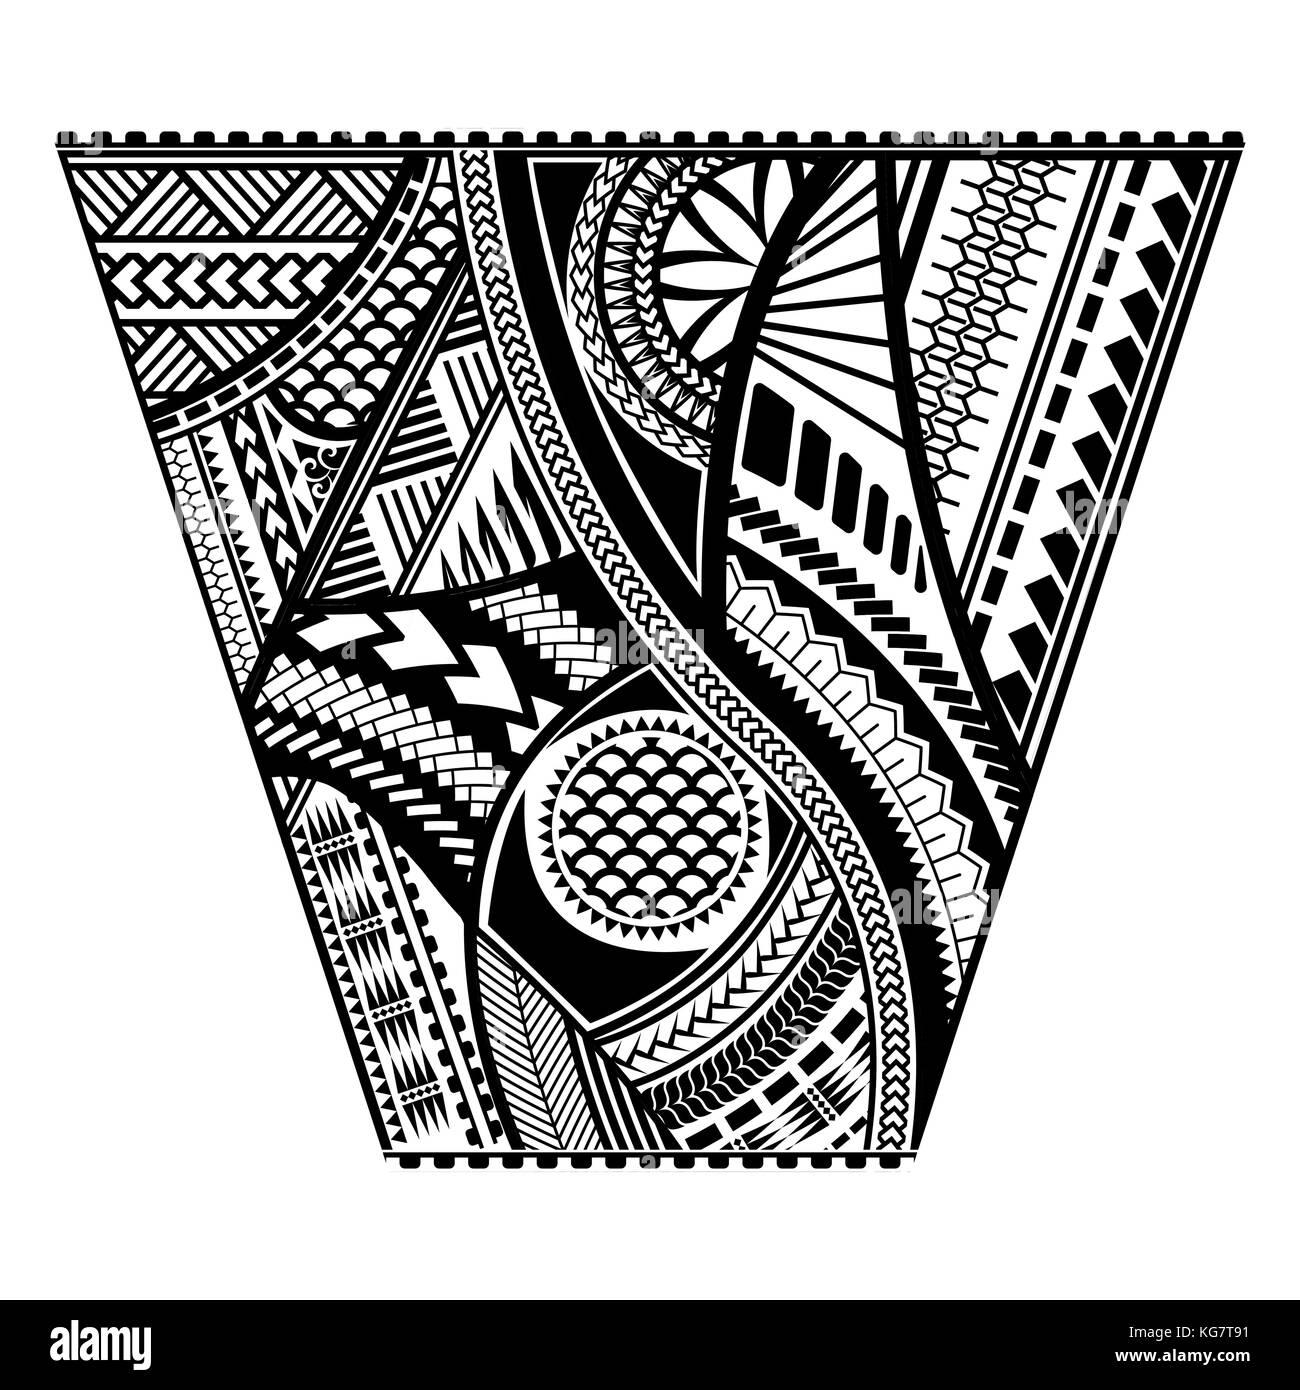 Polynesian Tattoo Stock Photos Polynesian Tattoo Stock Images Alamy